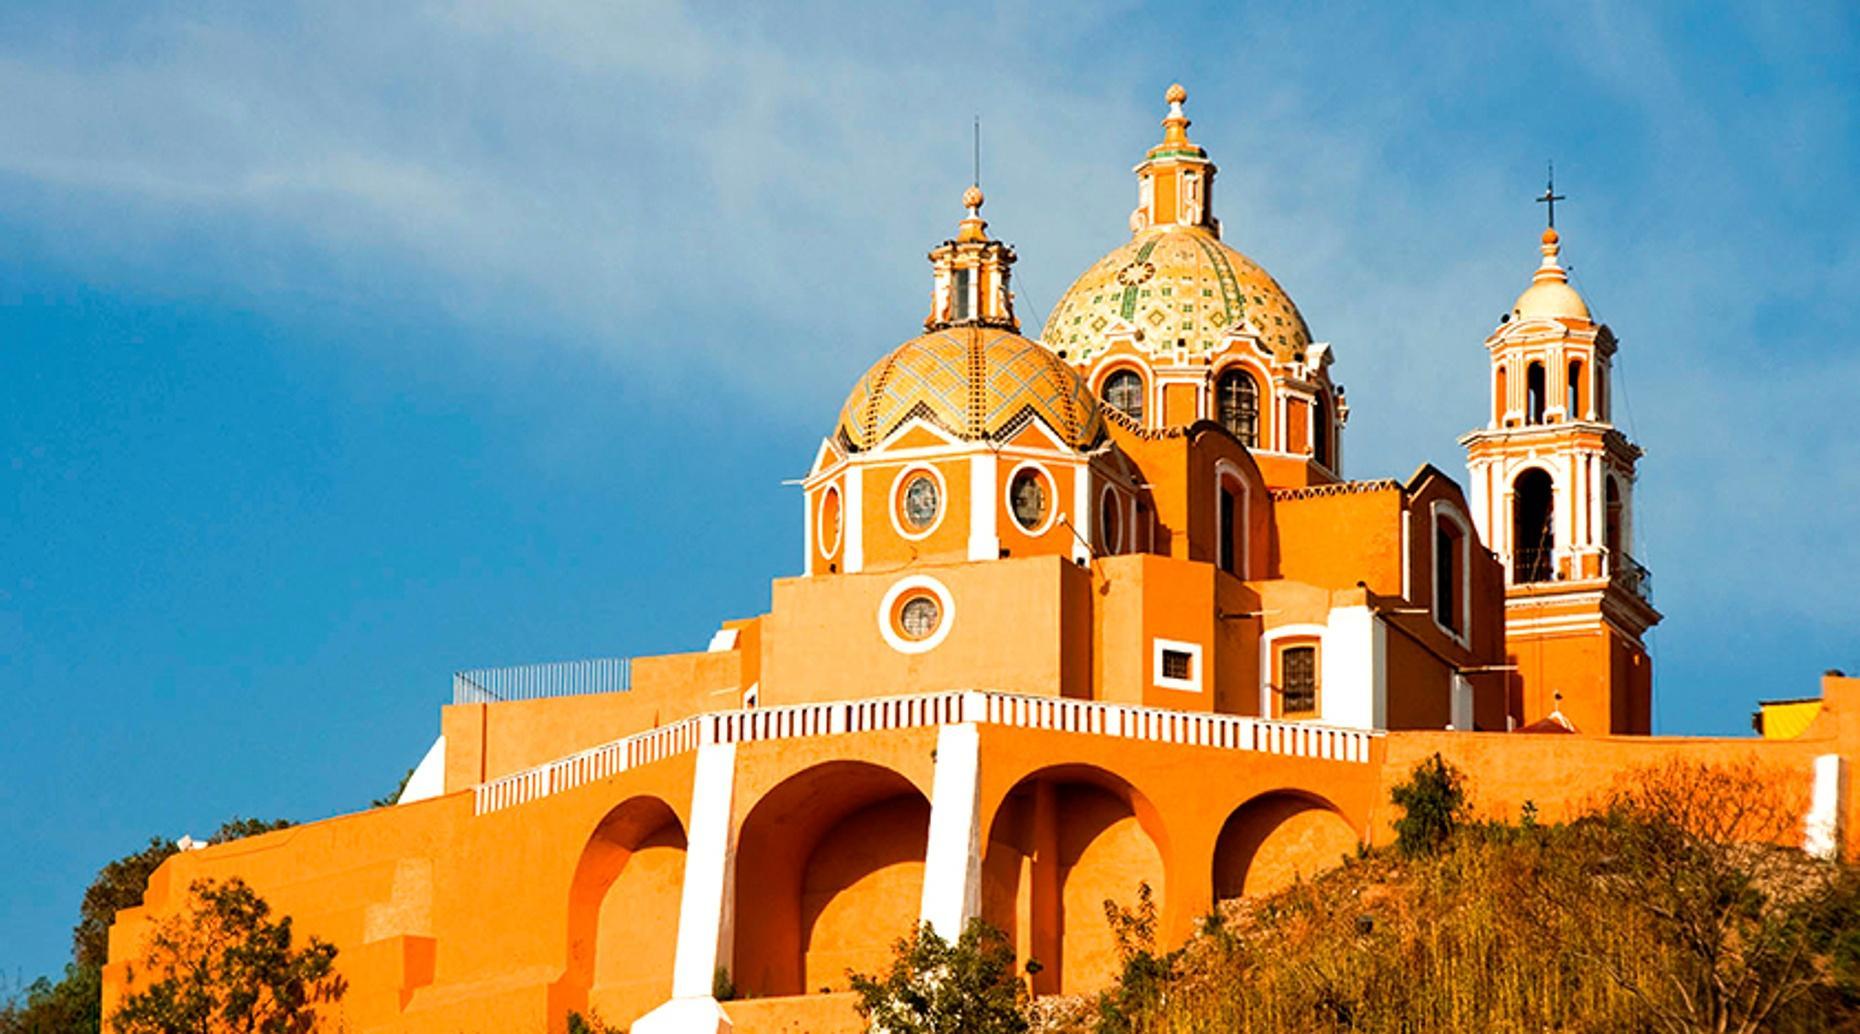 Mexico City Puebla and Cholula Tour